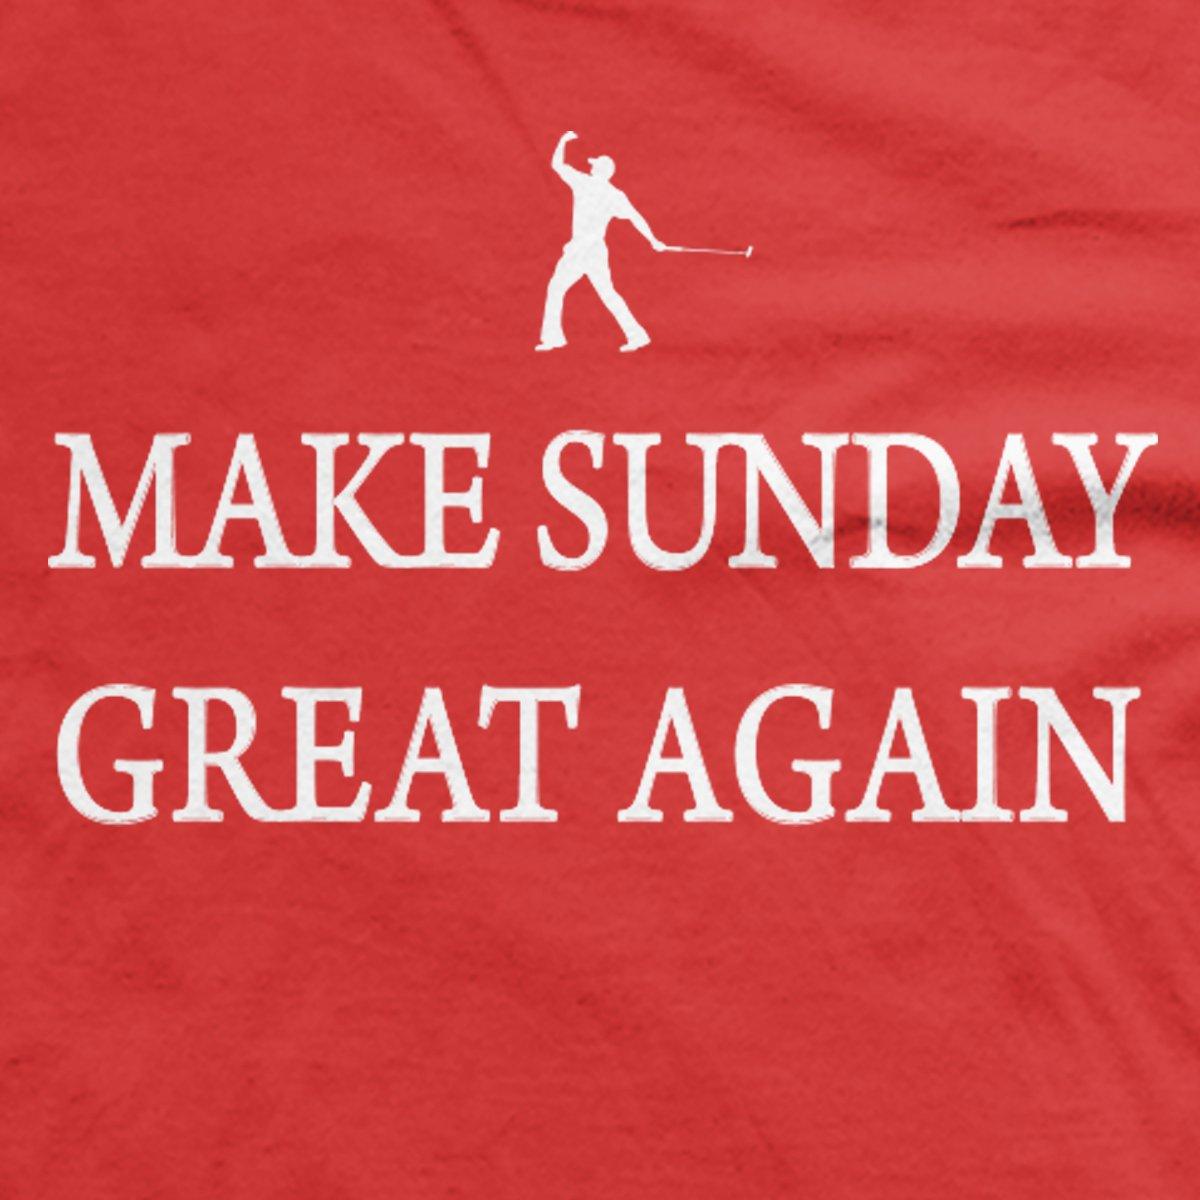 Make Sunday Great Again t-shirt